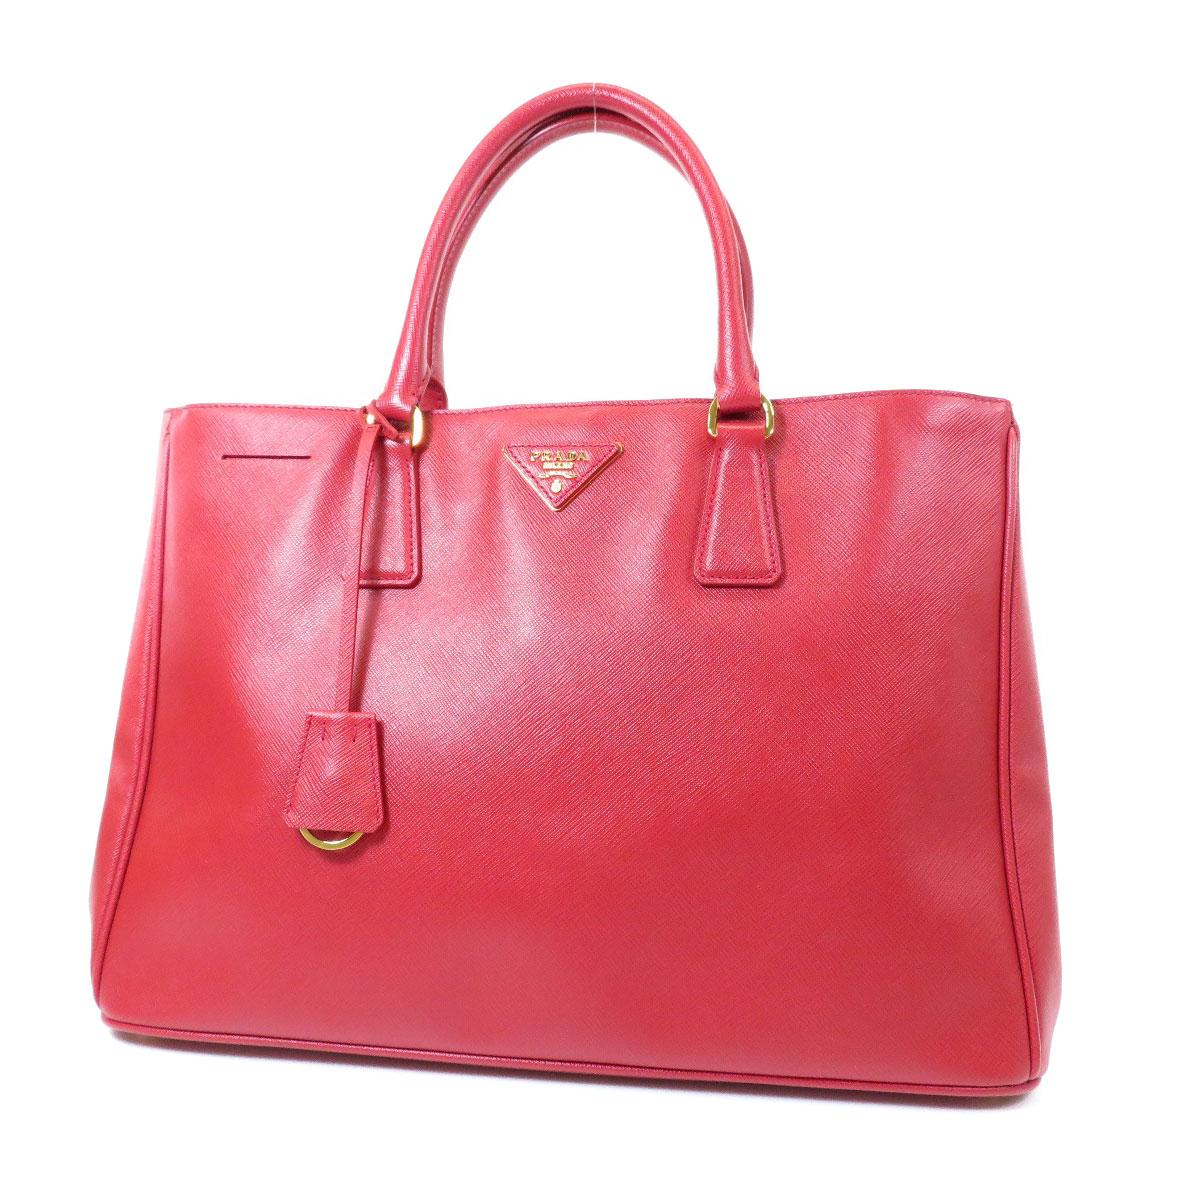 e94cae1bc662ea ... canvas tote rosa pink womenprada mini saffiano promenade bagpopular  stores greece prada prada tote bag leather ladies the best place to buy  brand bags ...